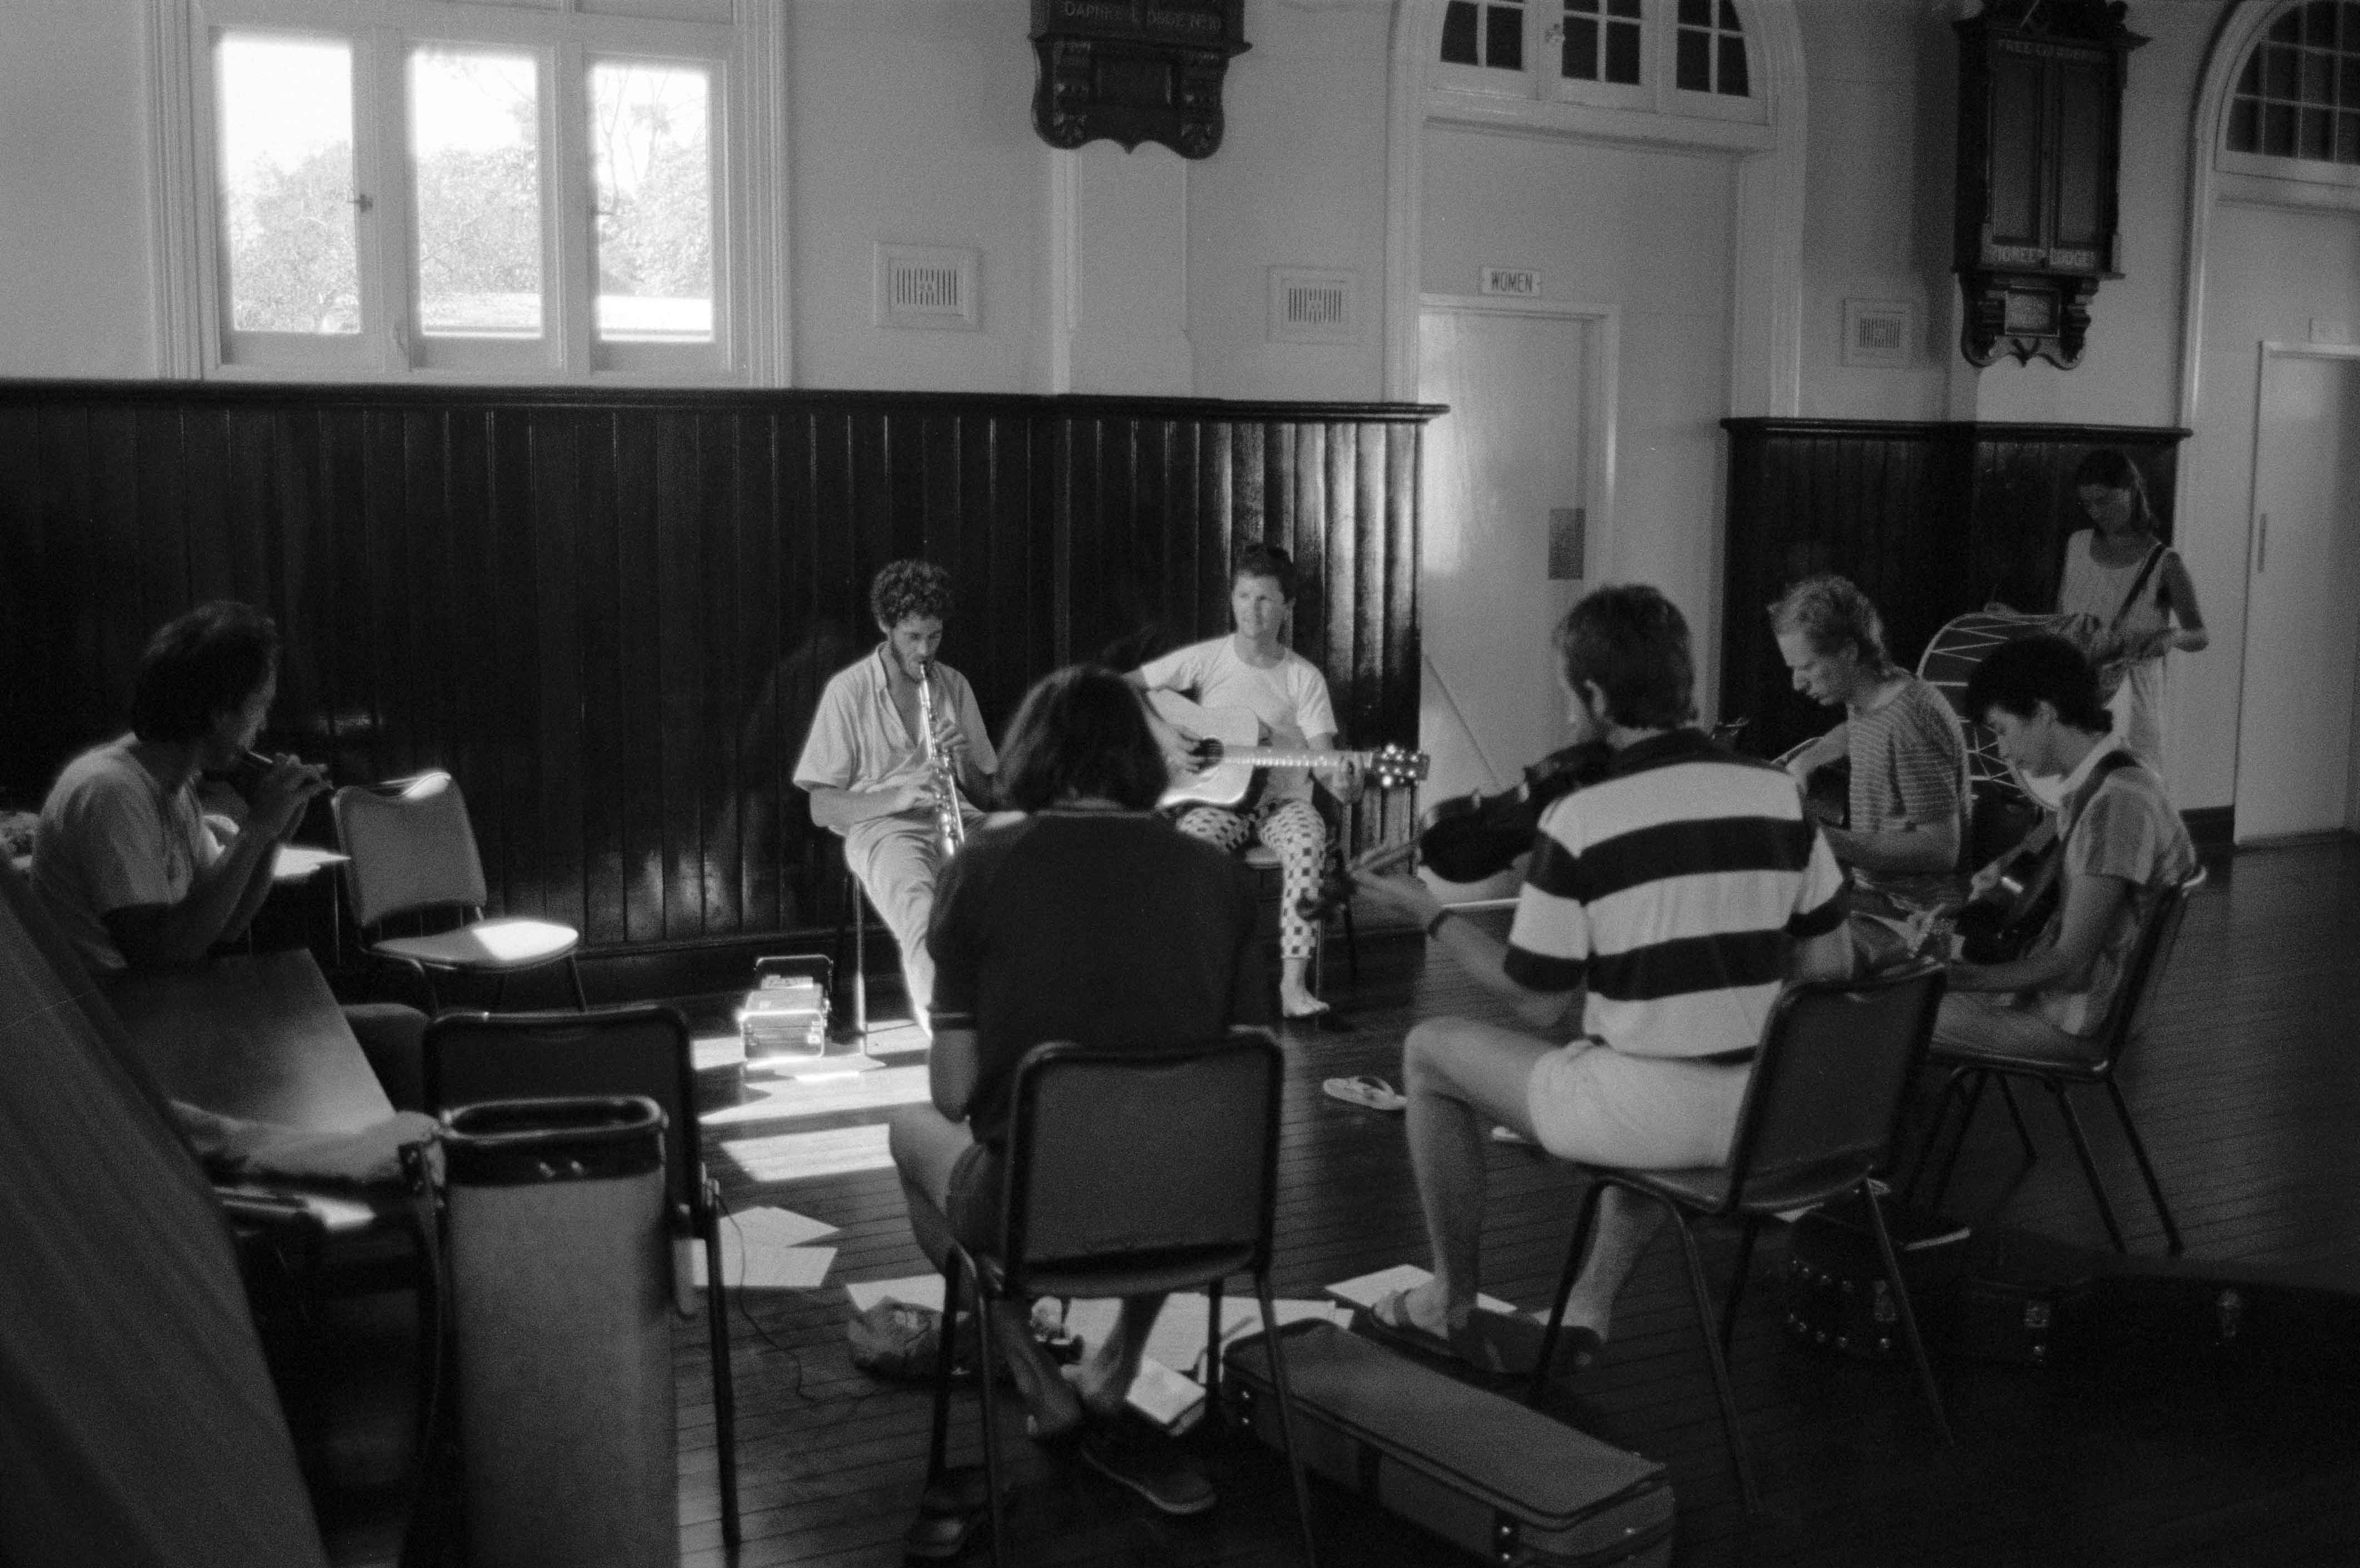 134. NP Ethnic Music Centre 1986